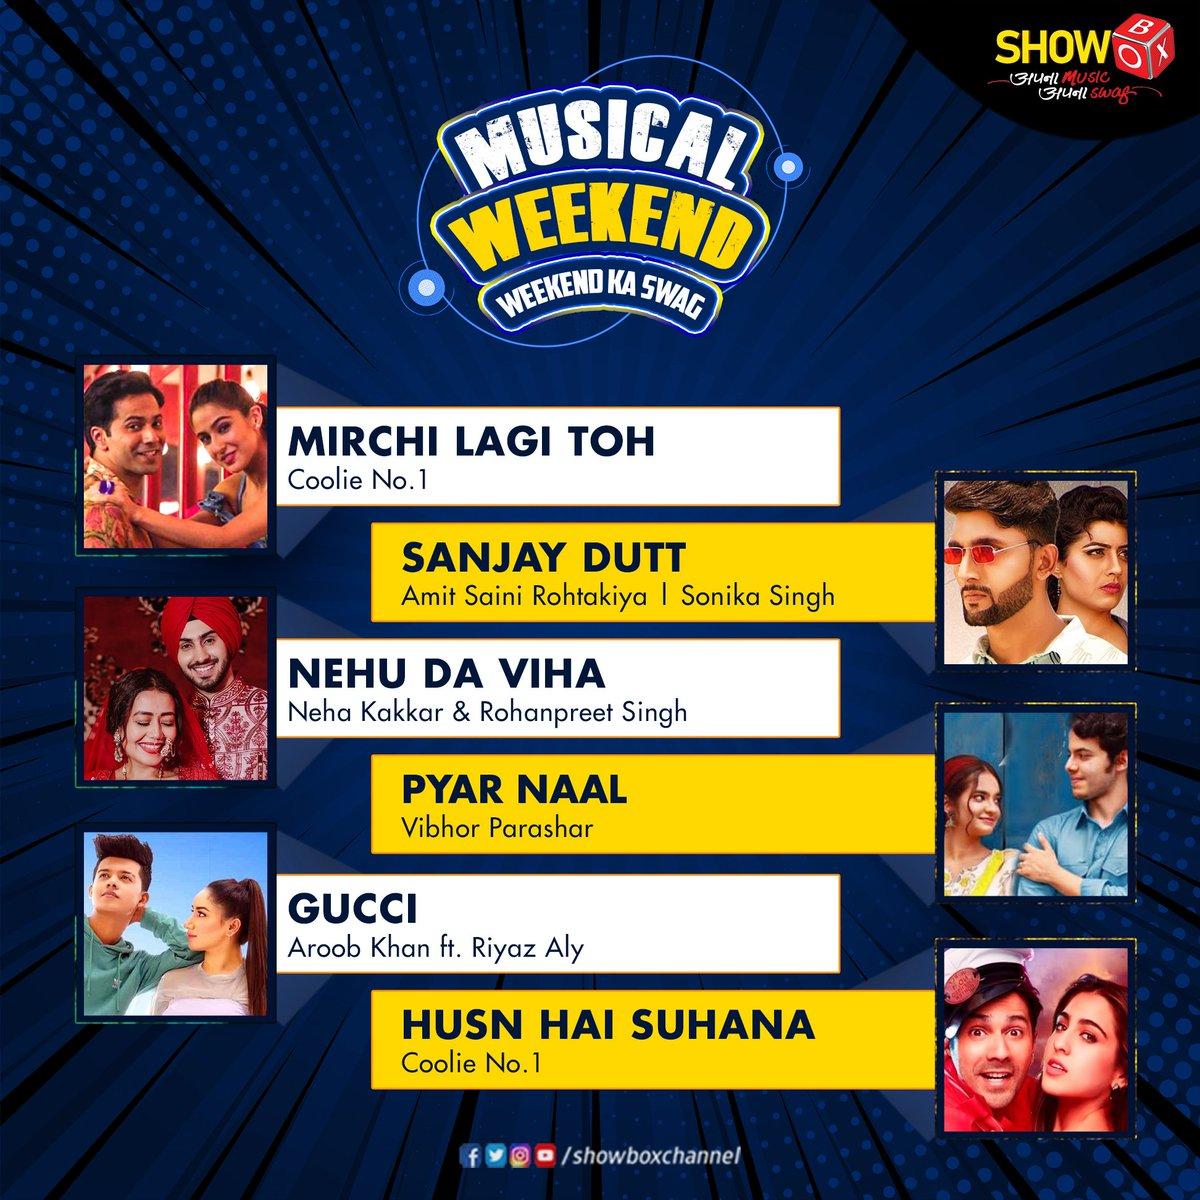 Naye saal mein karo jee bharke dhamaal.  Watch these blockbuster songs on ShowBox and enjoy 2021's first weekend in style.  #MirchiLagiToh #VarunDhawan #SaraAliKhan #SanjayDutt #SonikaSingh #AmitSainiRohtakiya #NehuDaVyah #NehaKakkar #RohanpreetSingh #Gucci #AroobKhan #RiyazAly